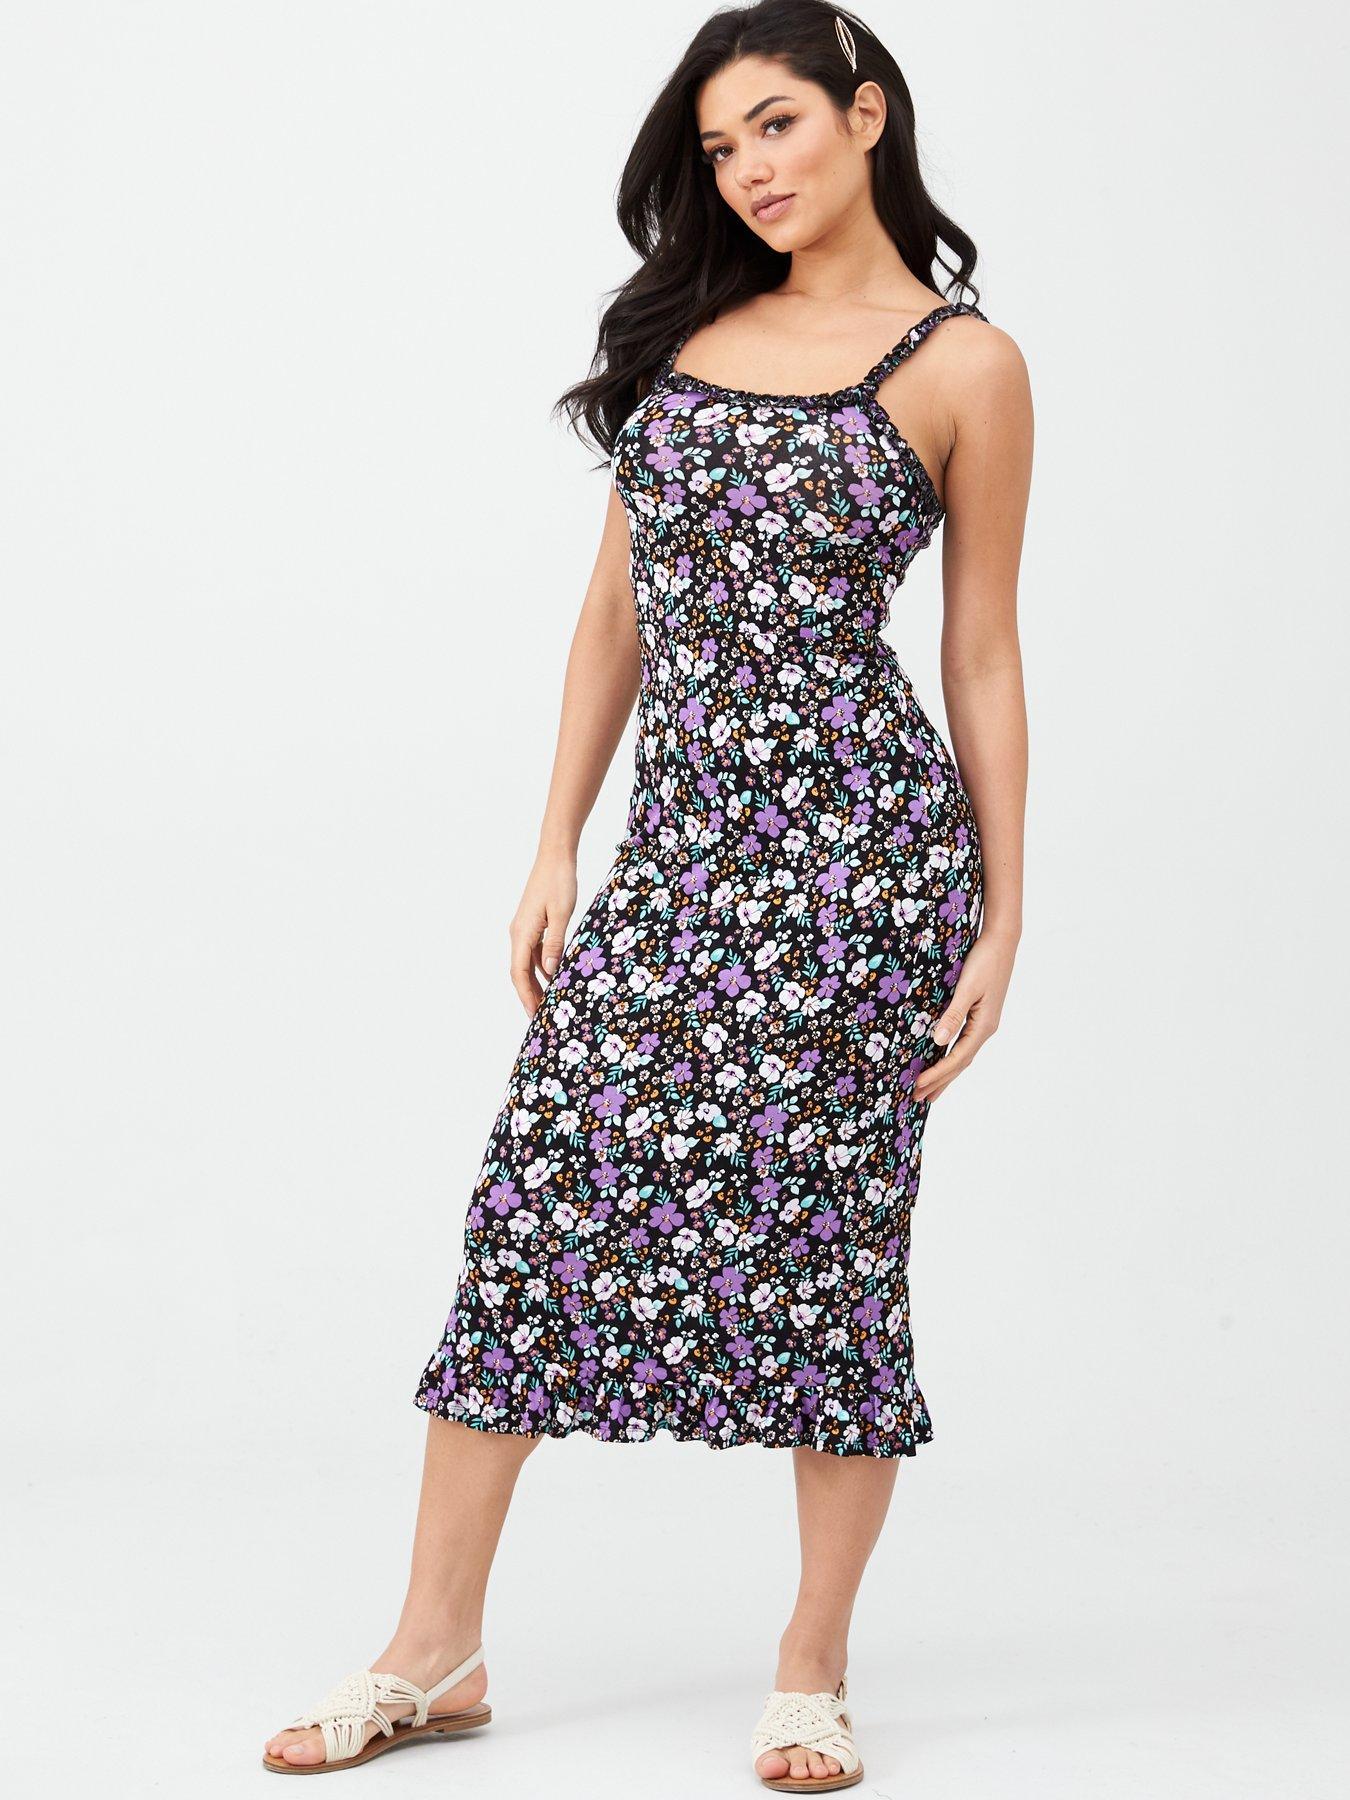 Brand New Women/'s Grey Floral Print Midi Party Bodycon Pencil Dress Size 8-16